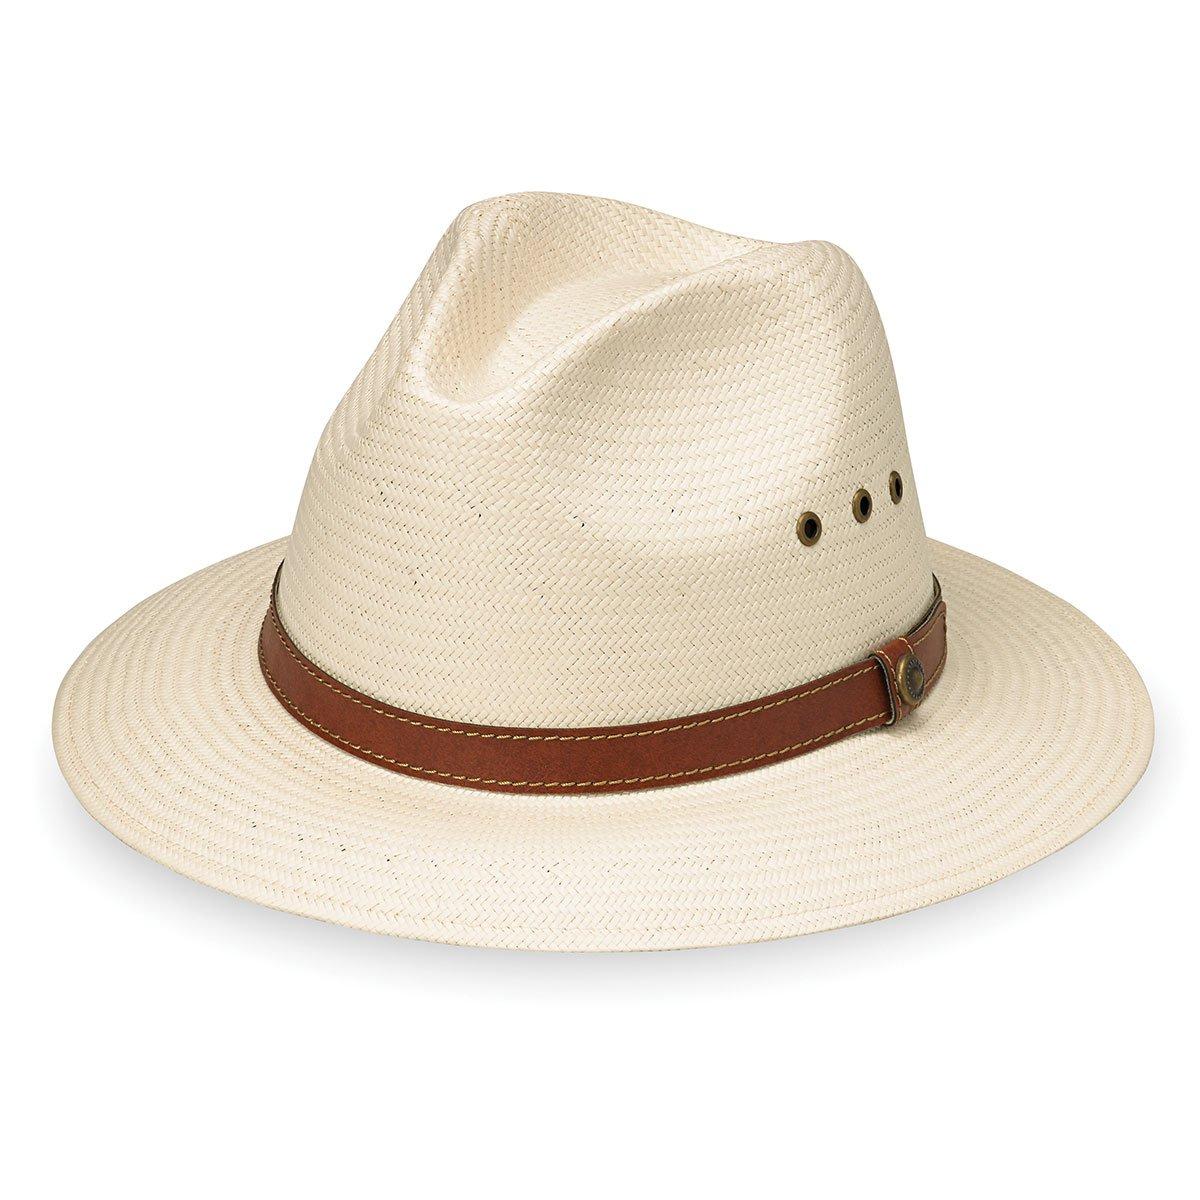 8354031e0b892e Wallaroo Hat Company Men's Avery Fedora – UPF 50+ Lightweight, Modern Sun  Hat, Designed in Australia